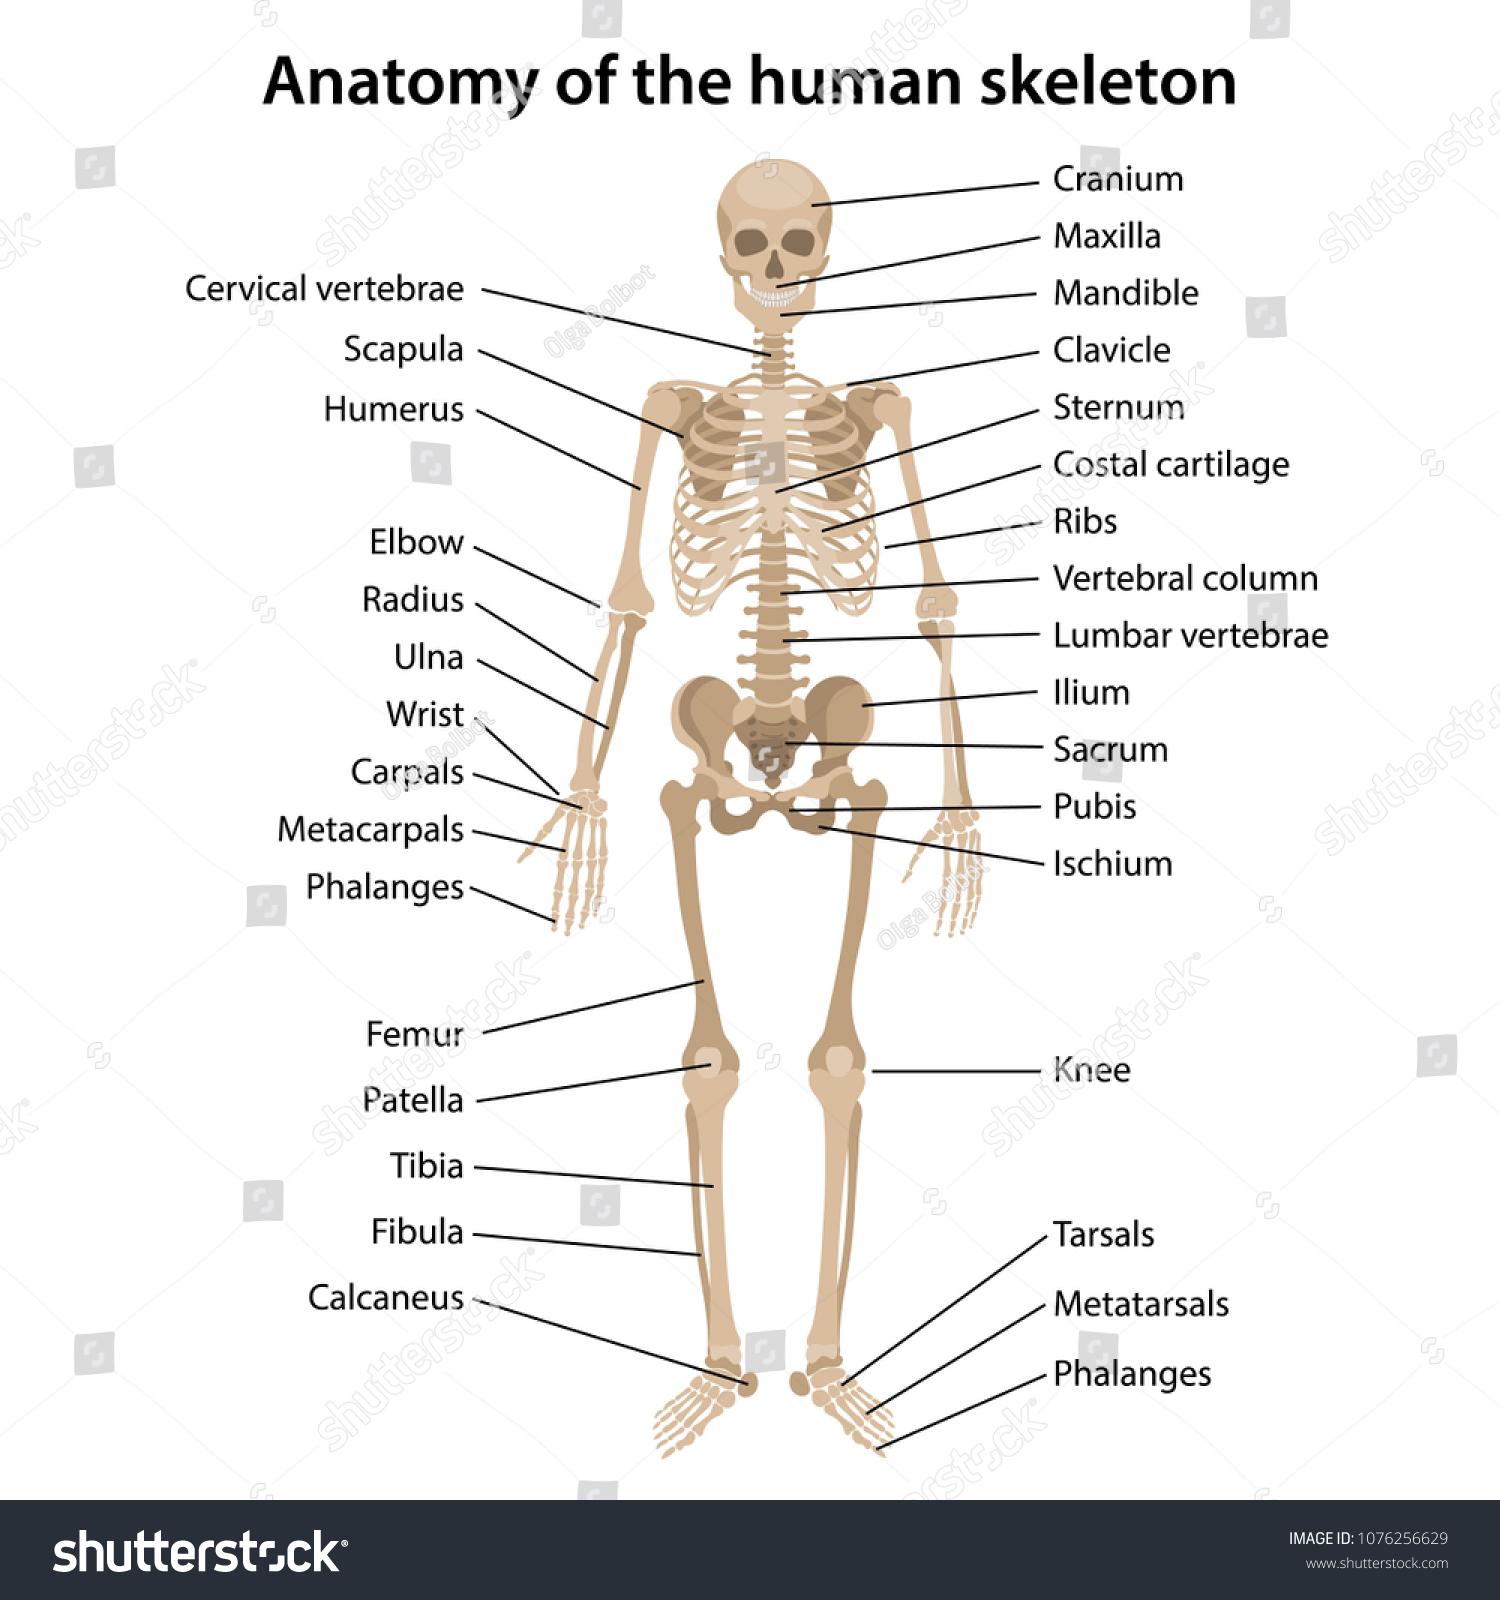 Anatomy Human Skeleton Main Parts Labeled Stock Vector Royalty Free